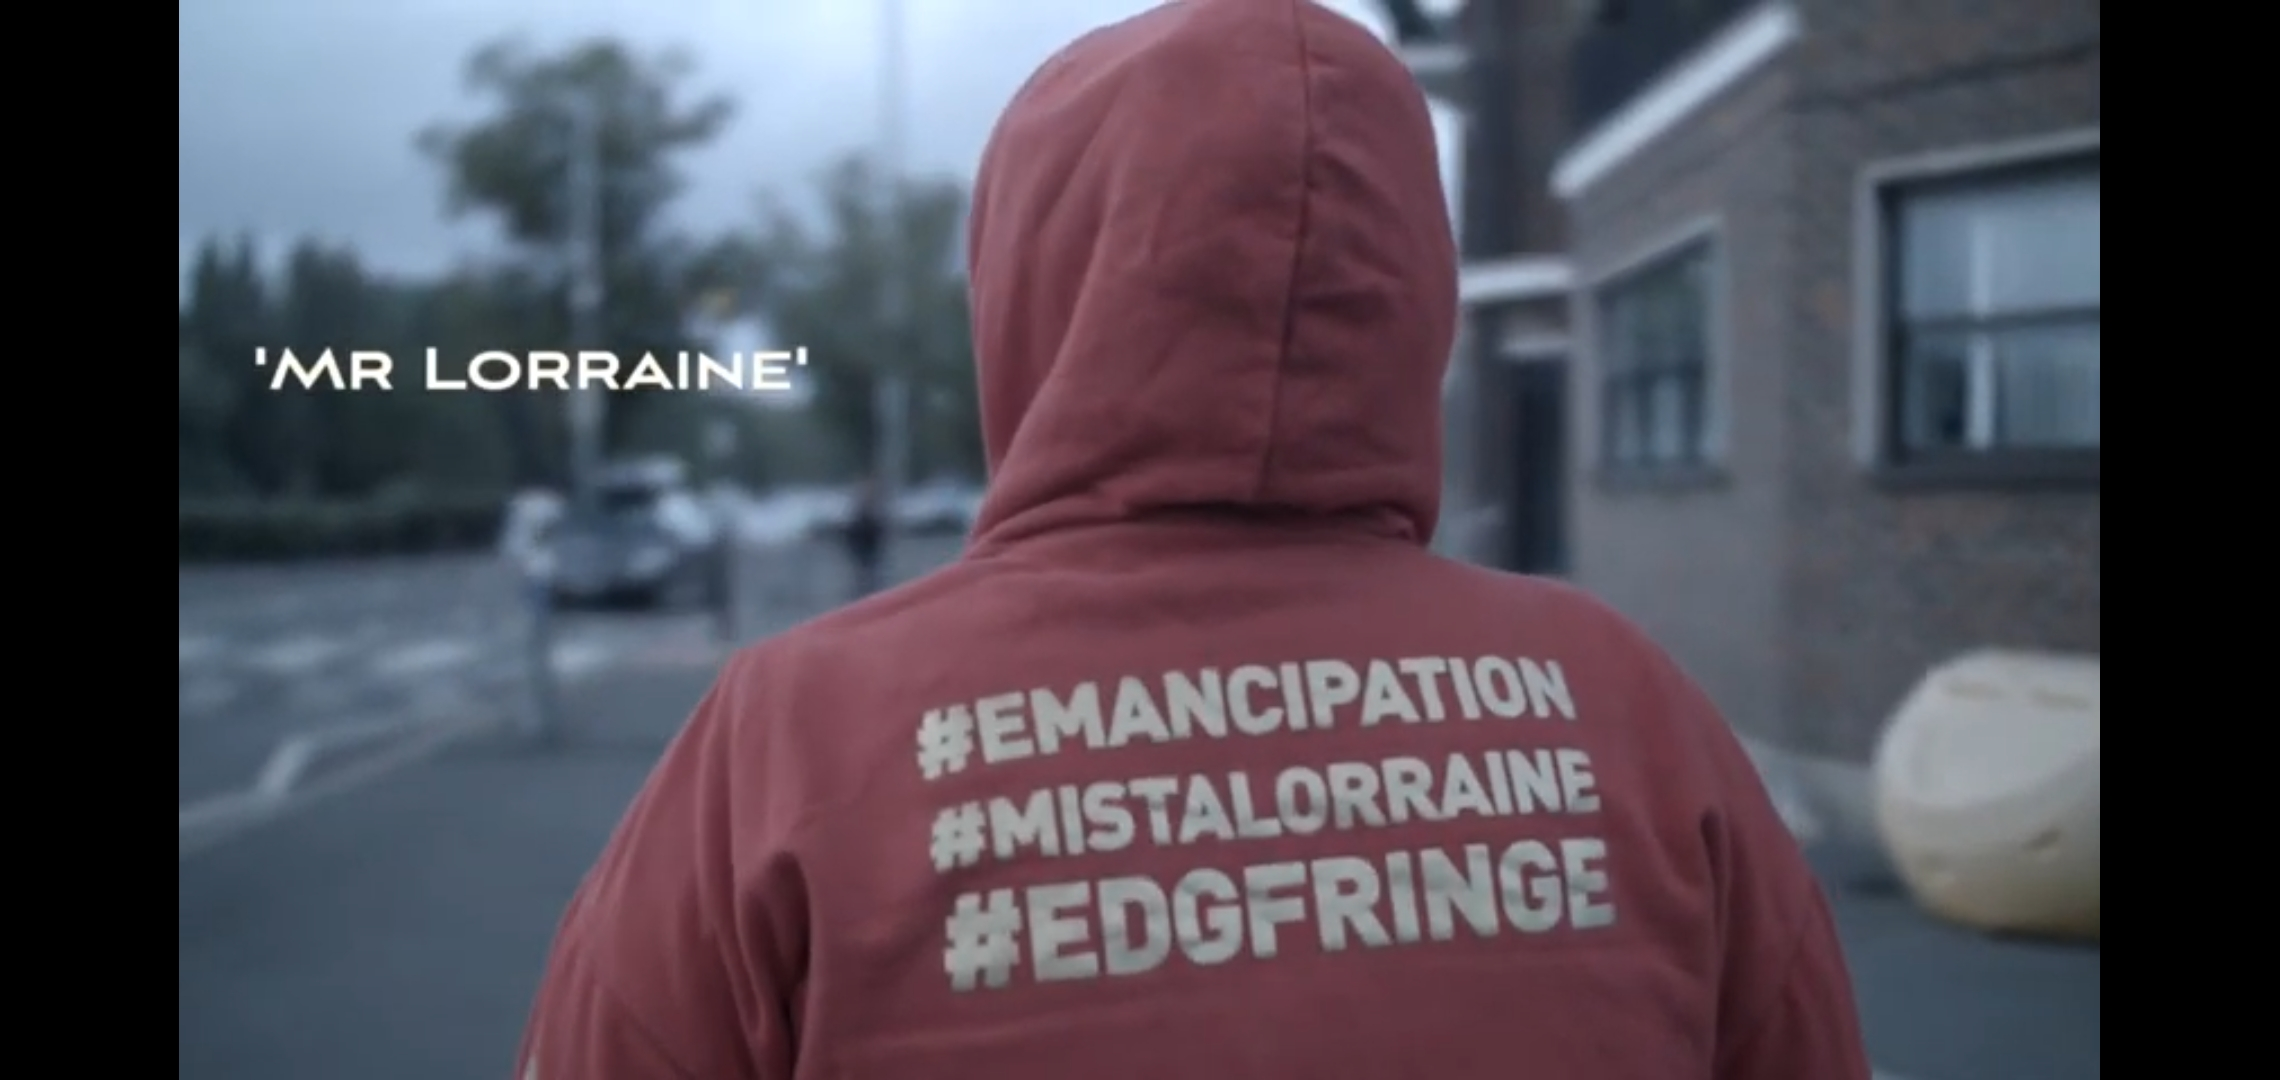 Mr Lorraine Documentary Rode Reel 2020